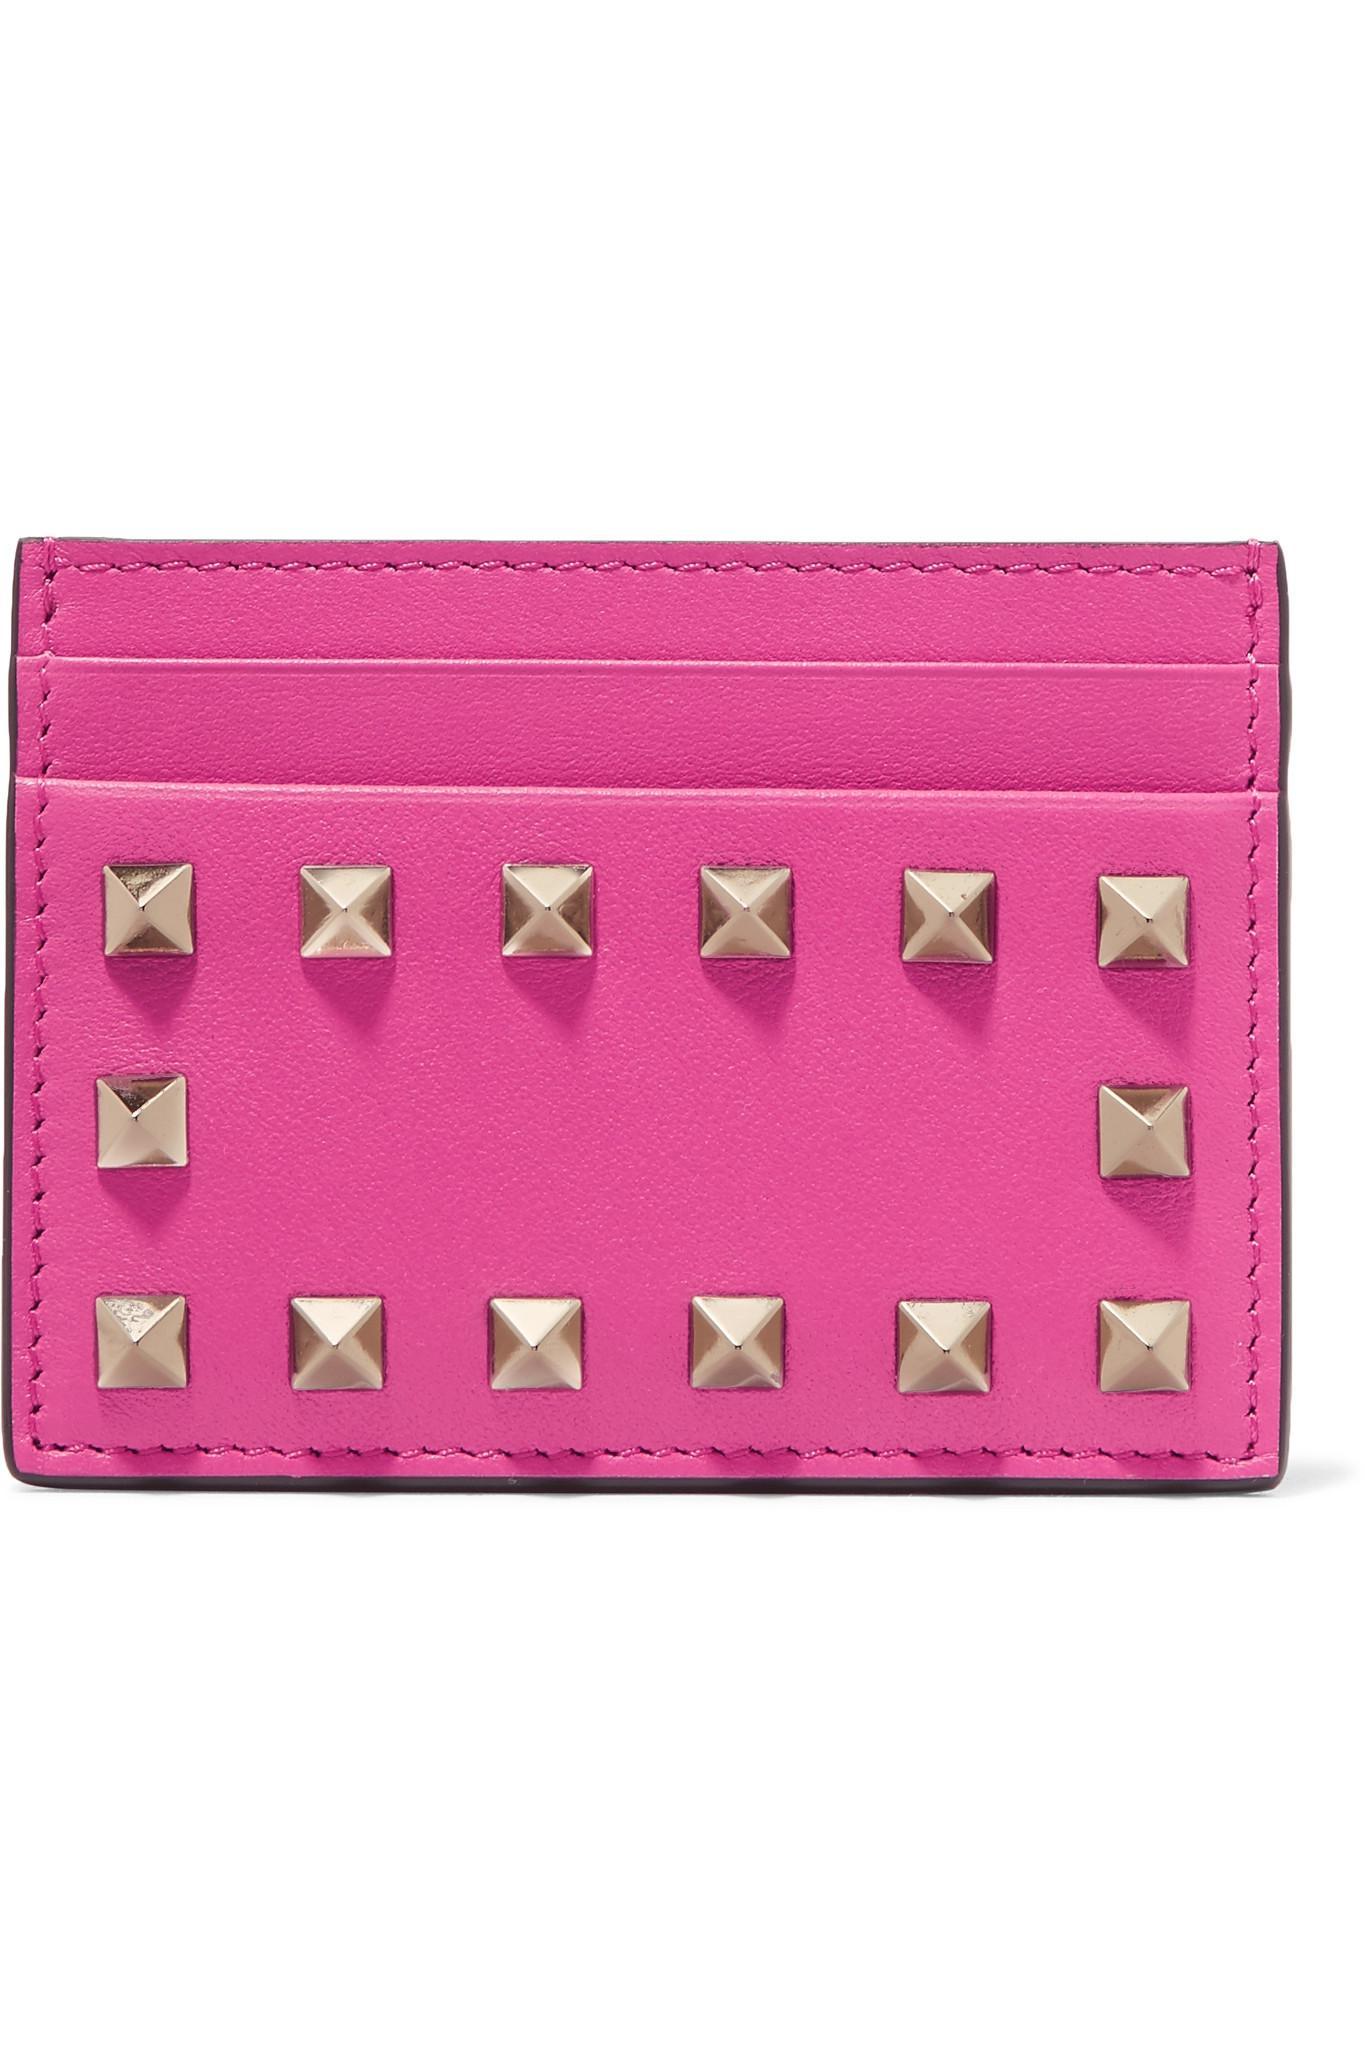 Rockstud cardholder - Pink & Purple Valentino LBSo4NTD